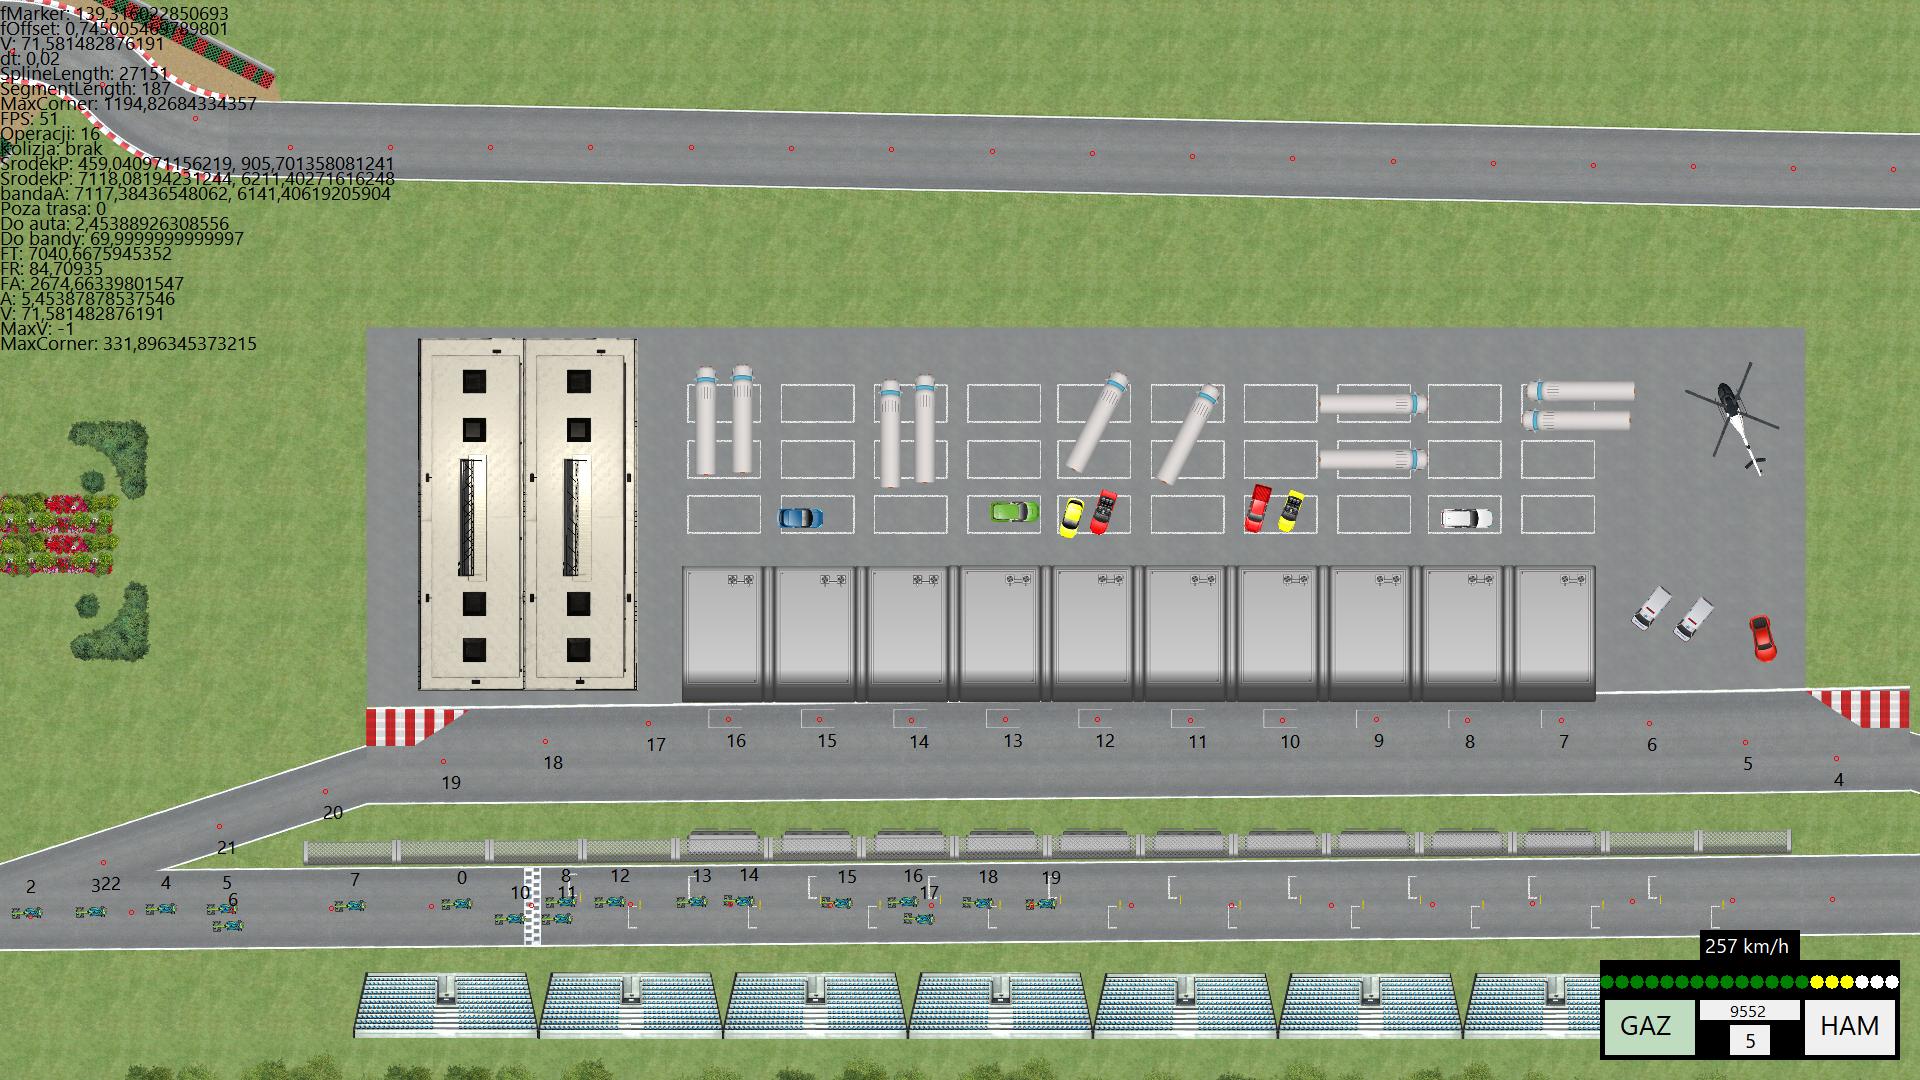 racingScreen.png